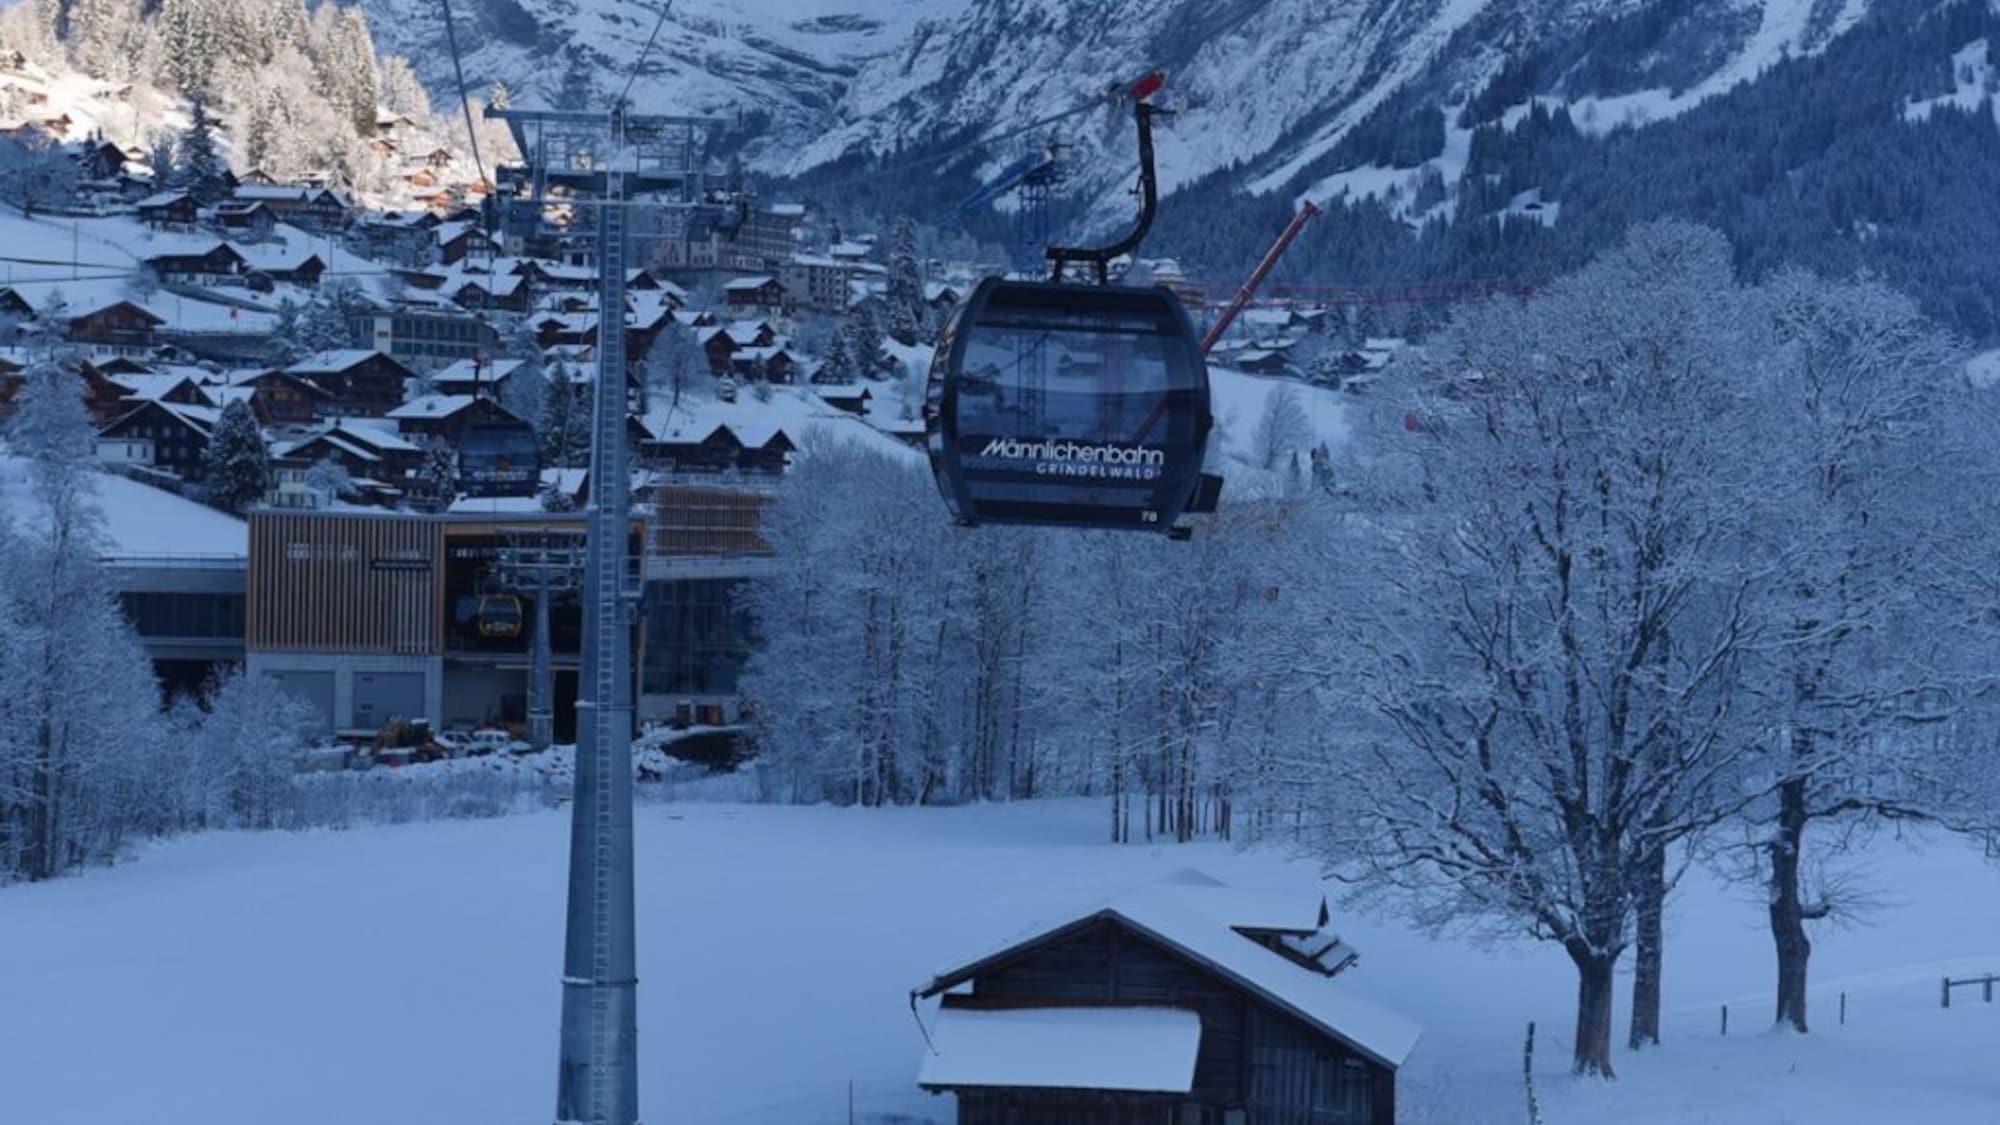 Bergbahnen: Erster Teil des V-Bahnprojekts im Jungfraugebiet eröffnet